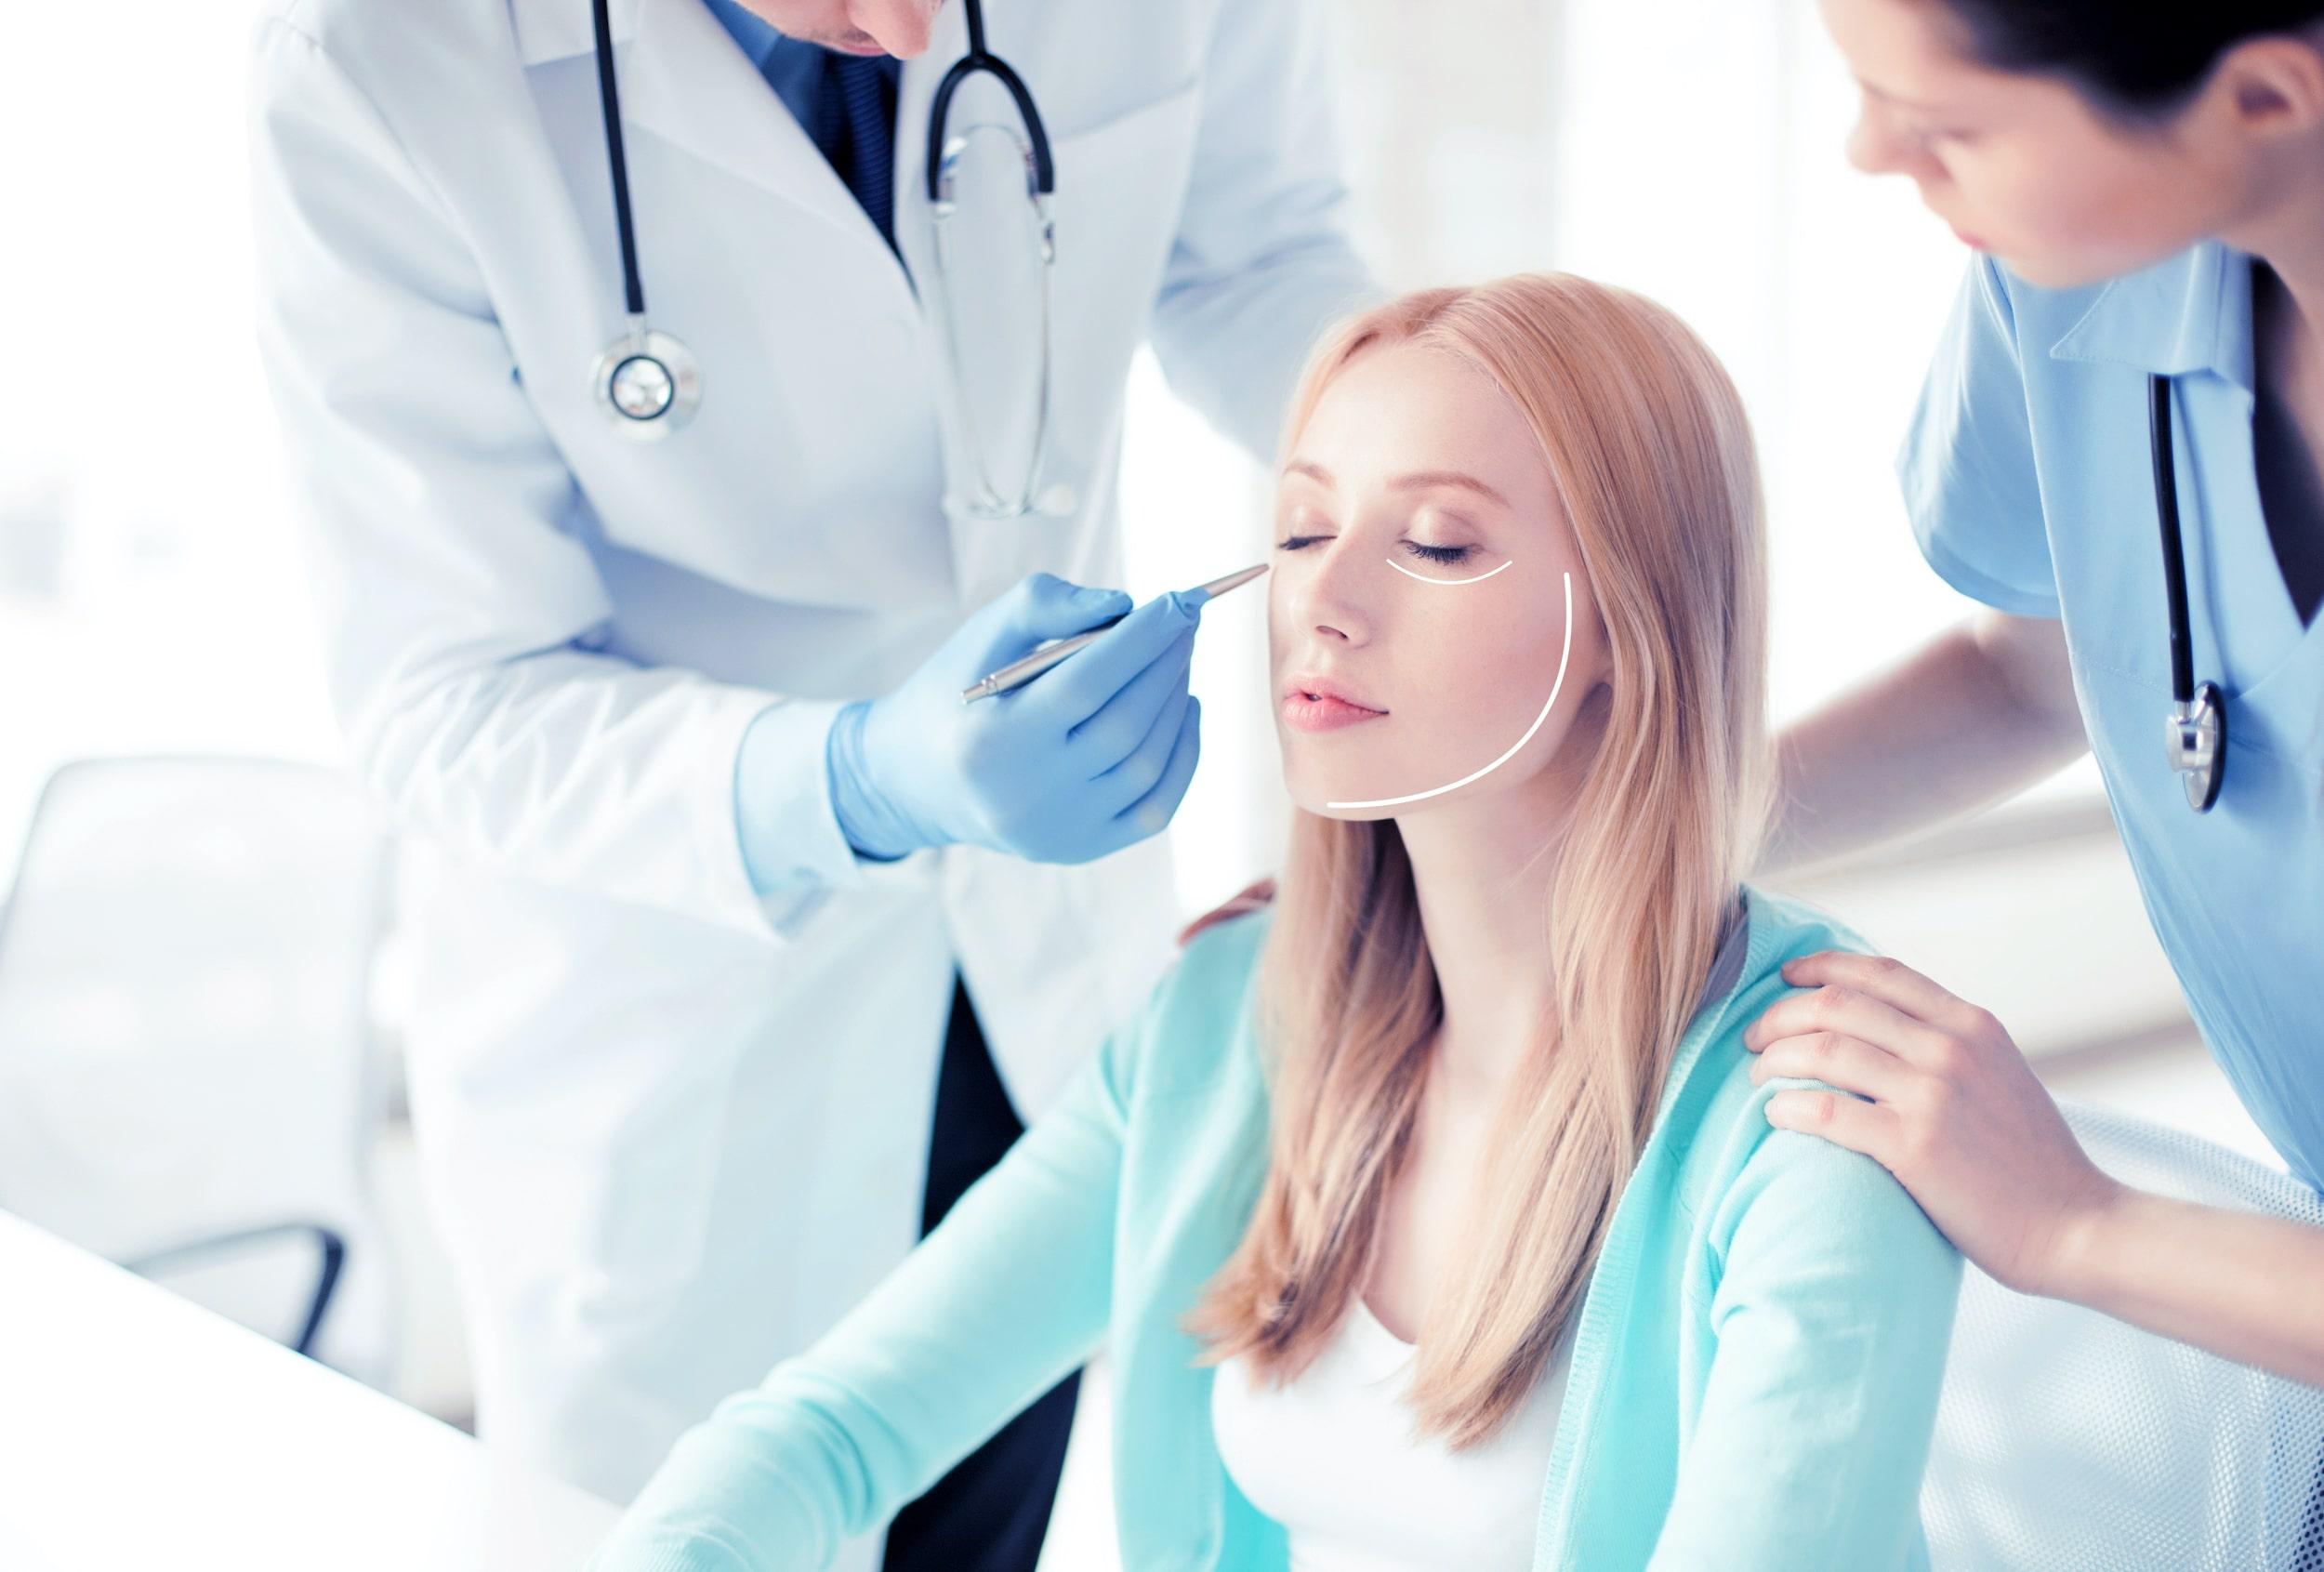 3 reasons you should consider career as cosmetic nurse